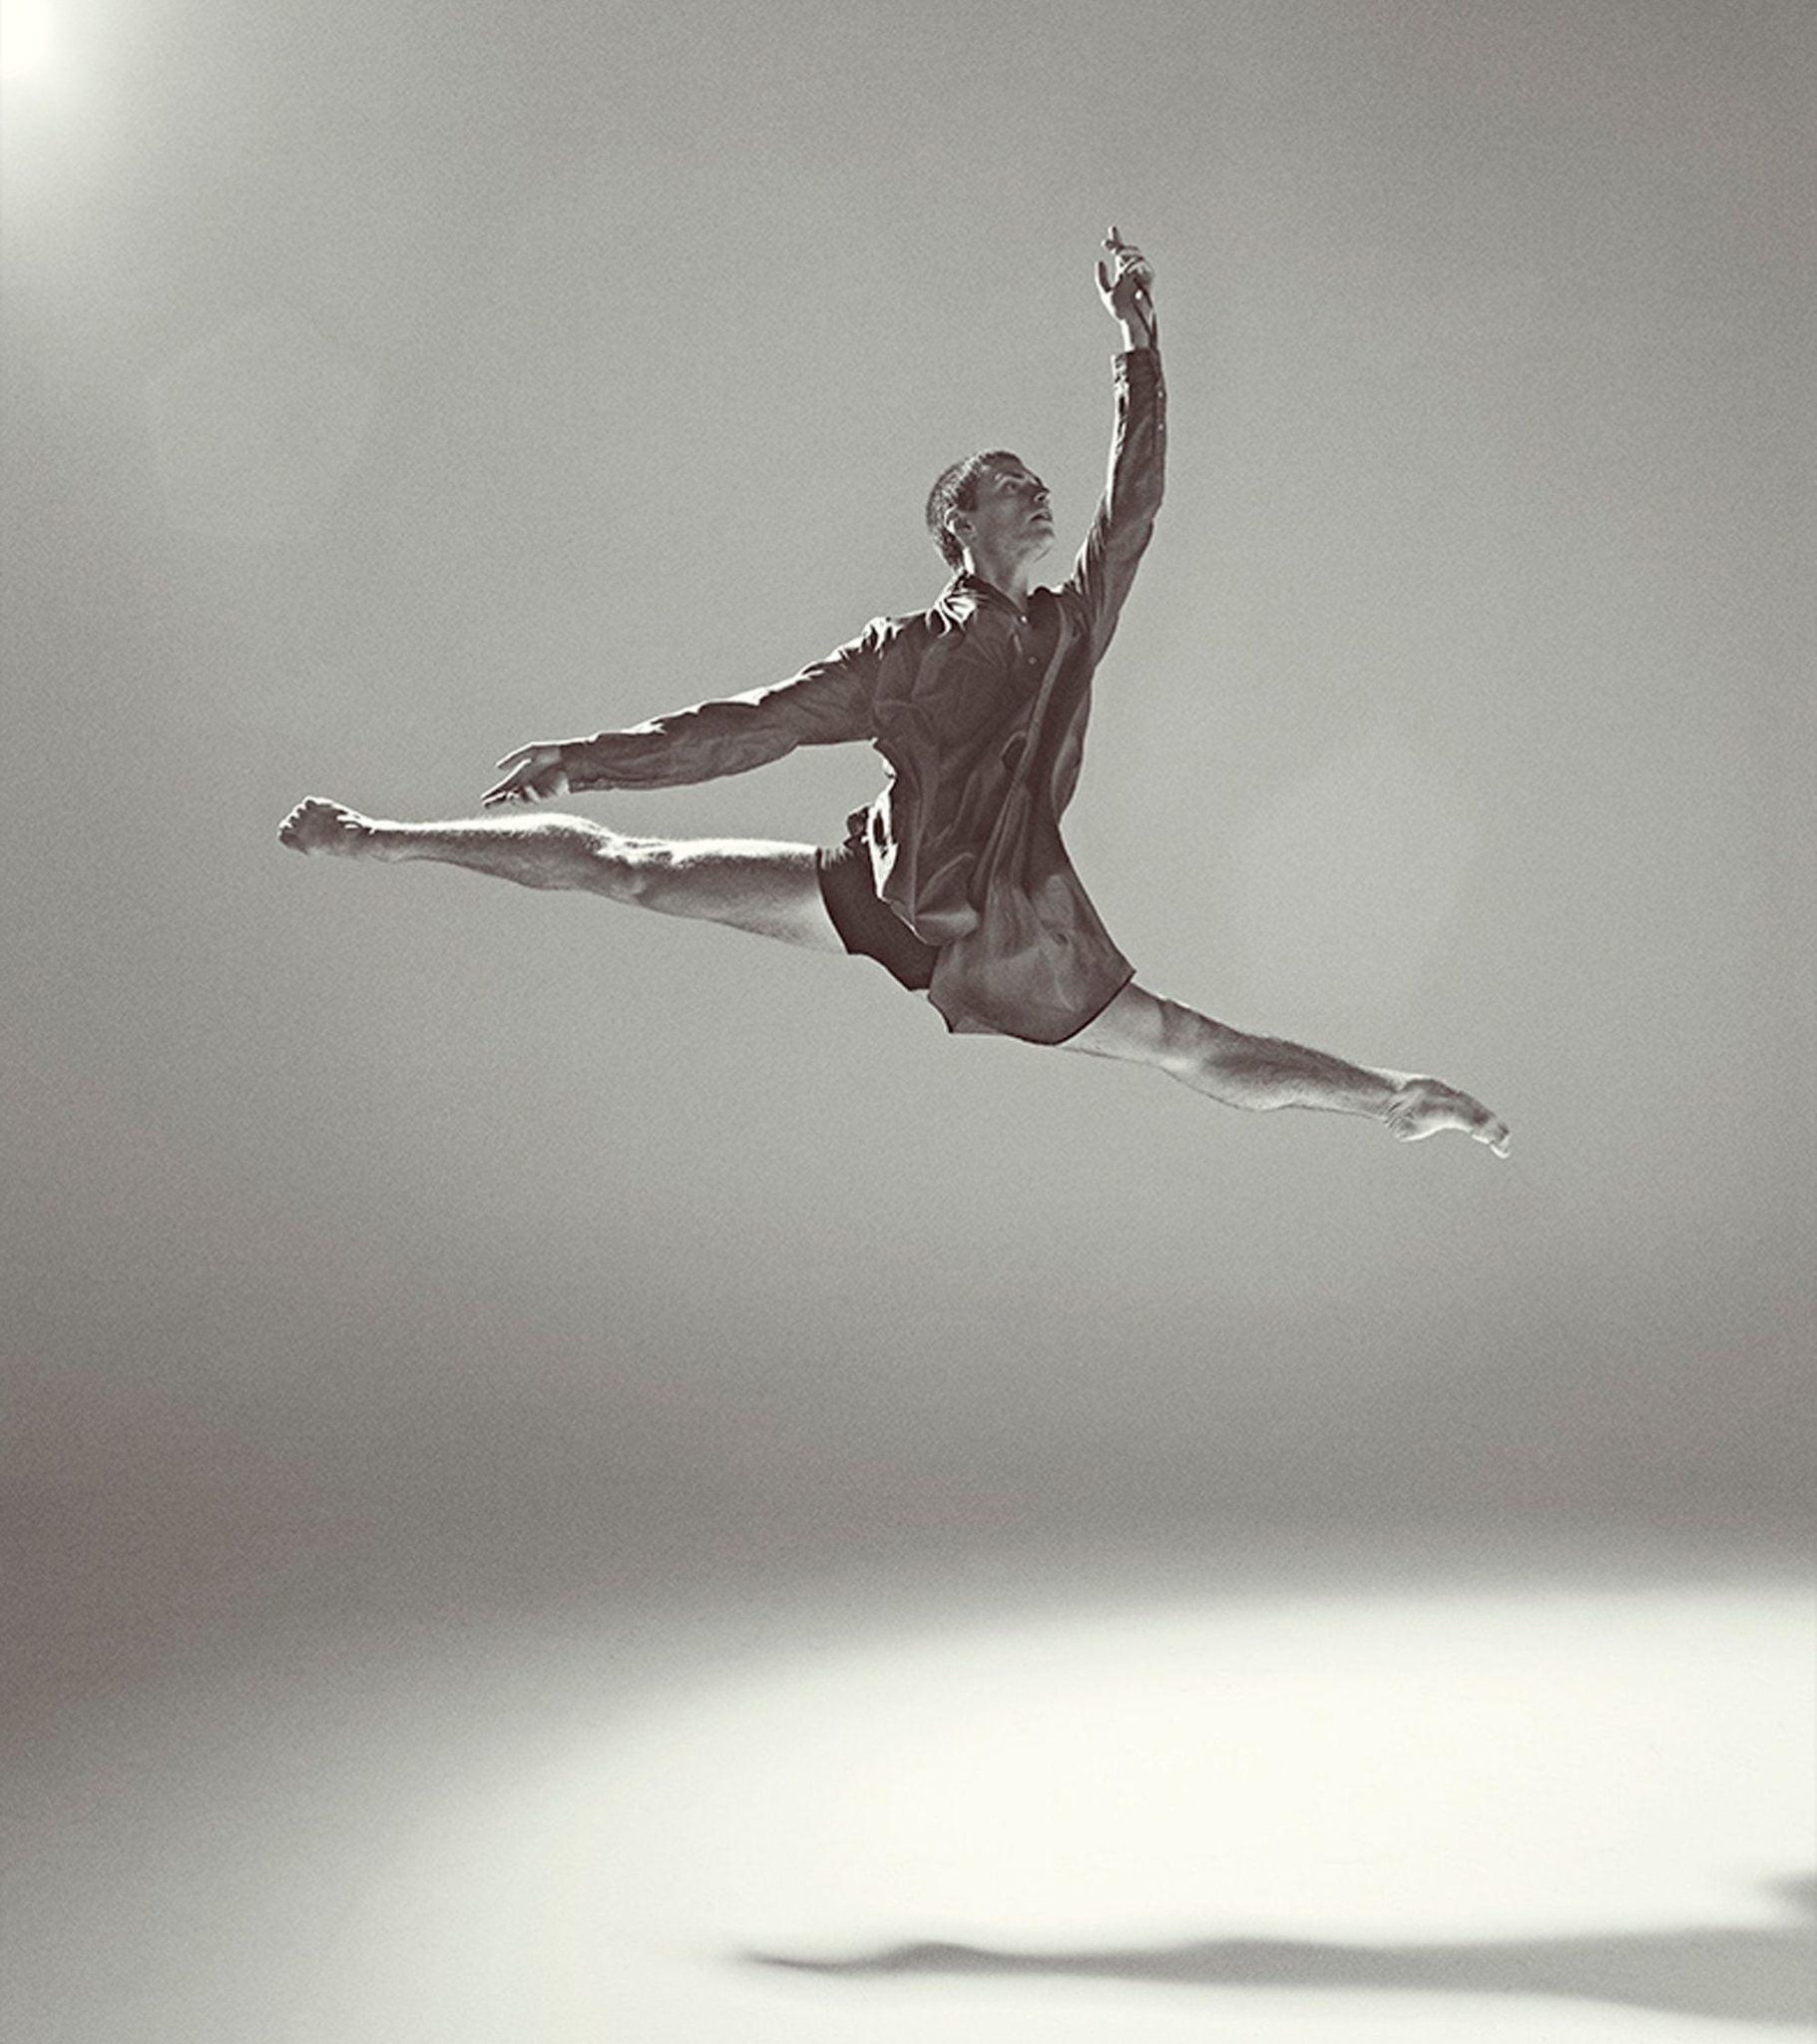 Sergei Polunin: Ο χορός διέξοδο ή αιώνια φυλακή;